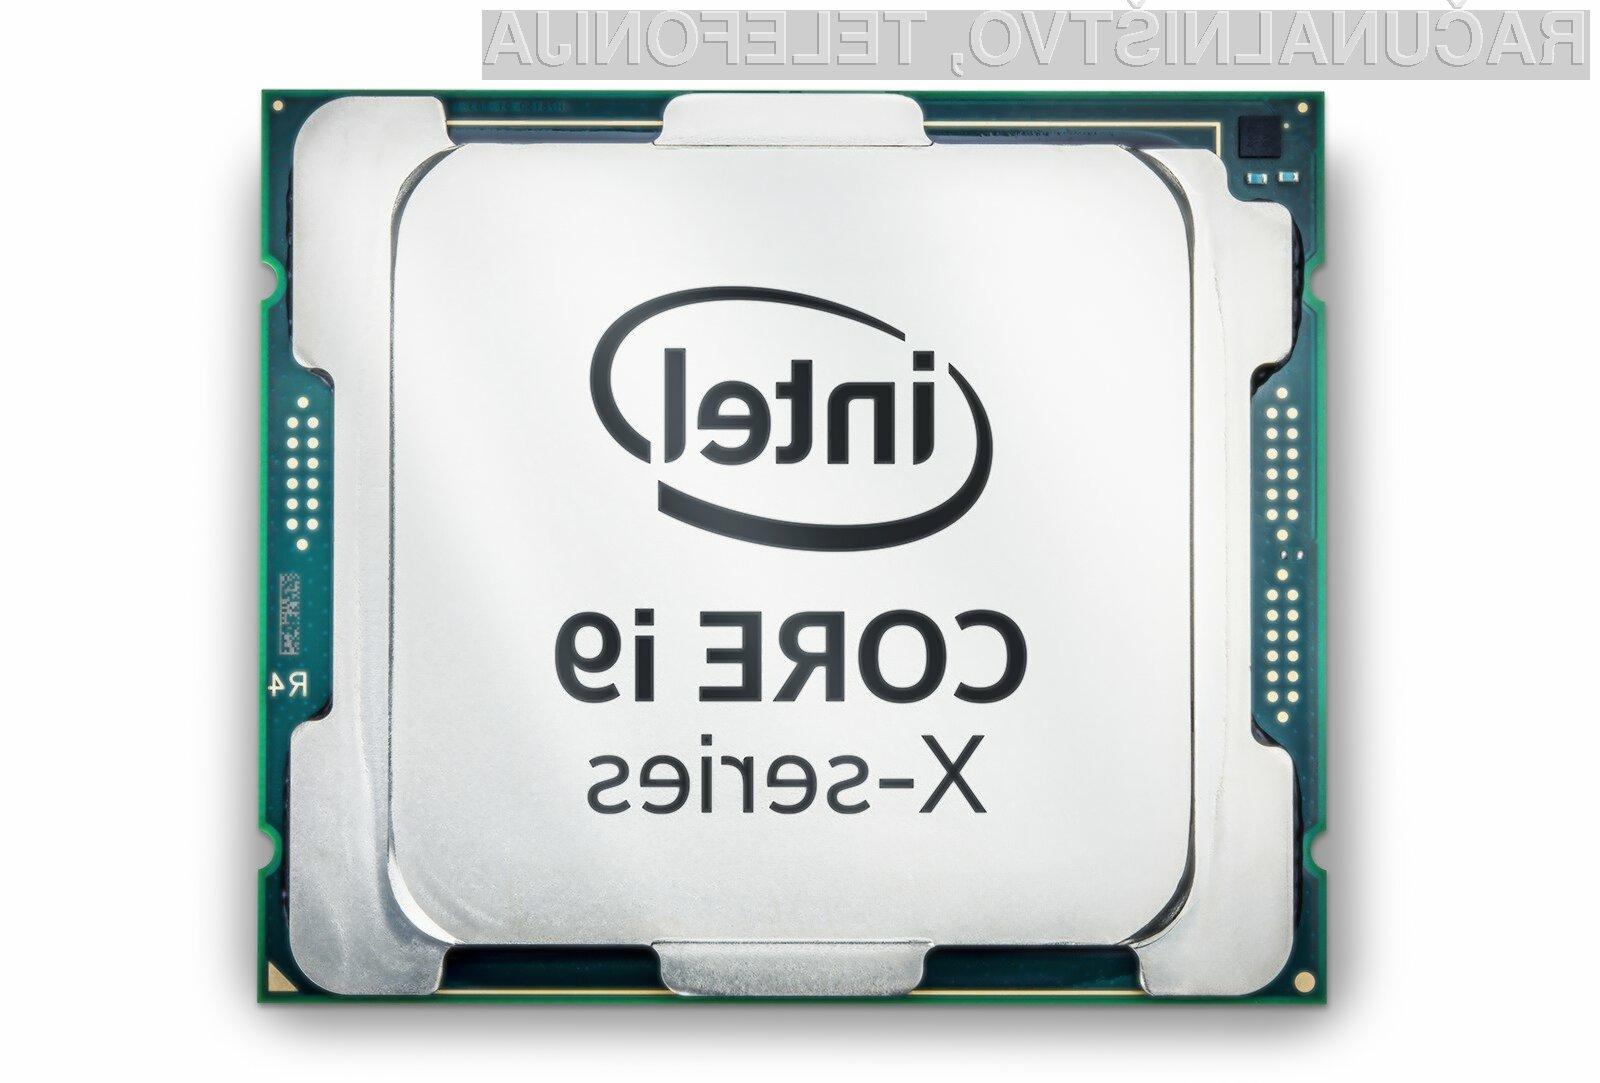 Procesorji Intel Core i9 s kar 16 sredicami!